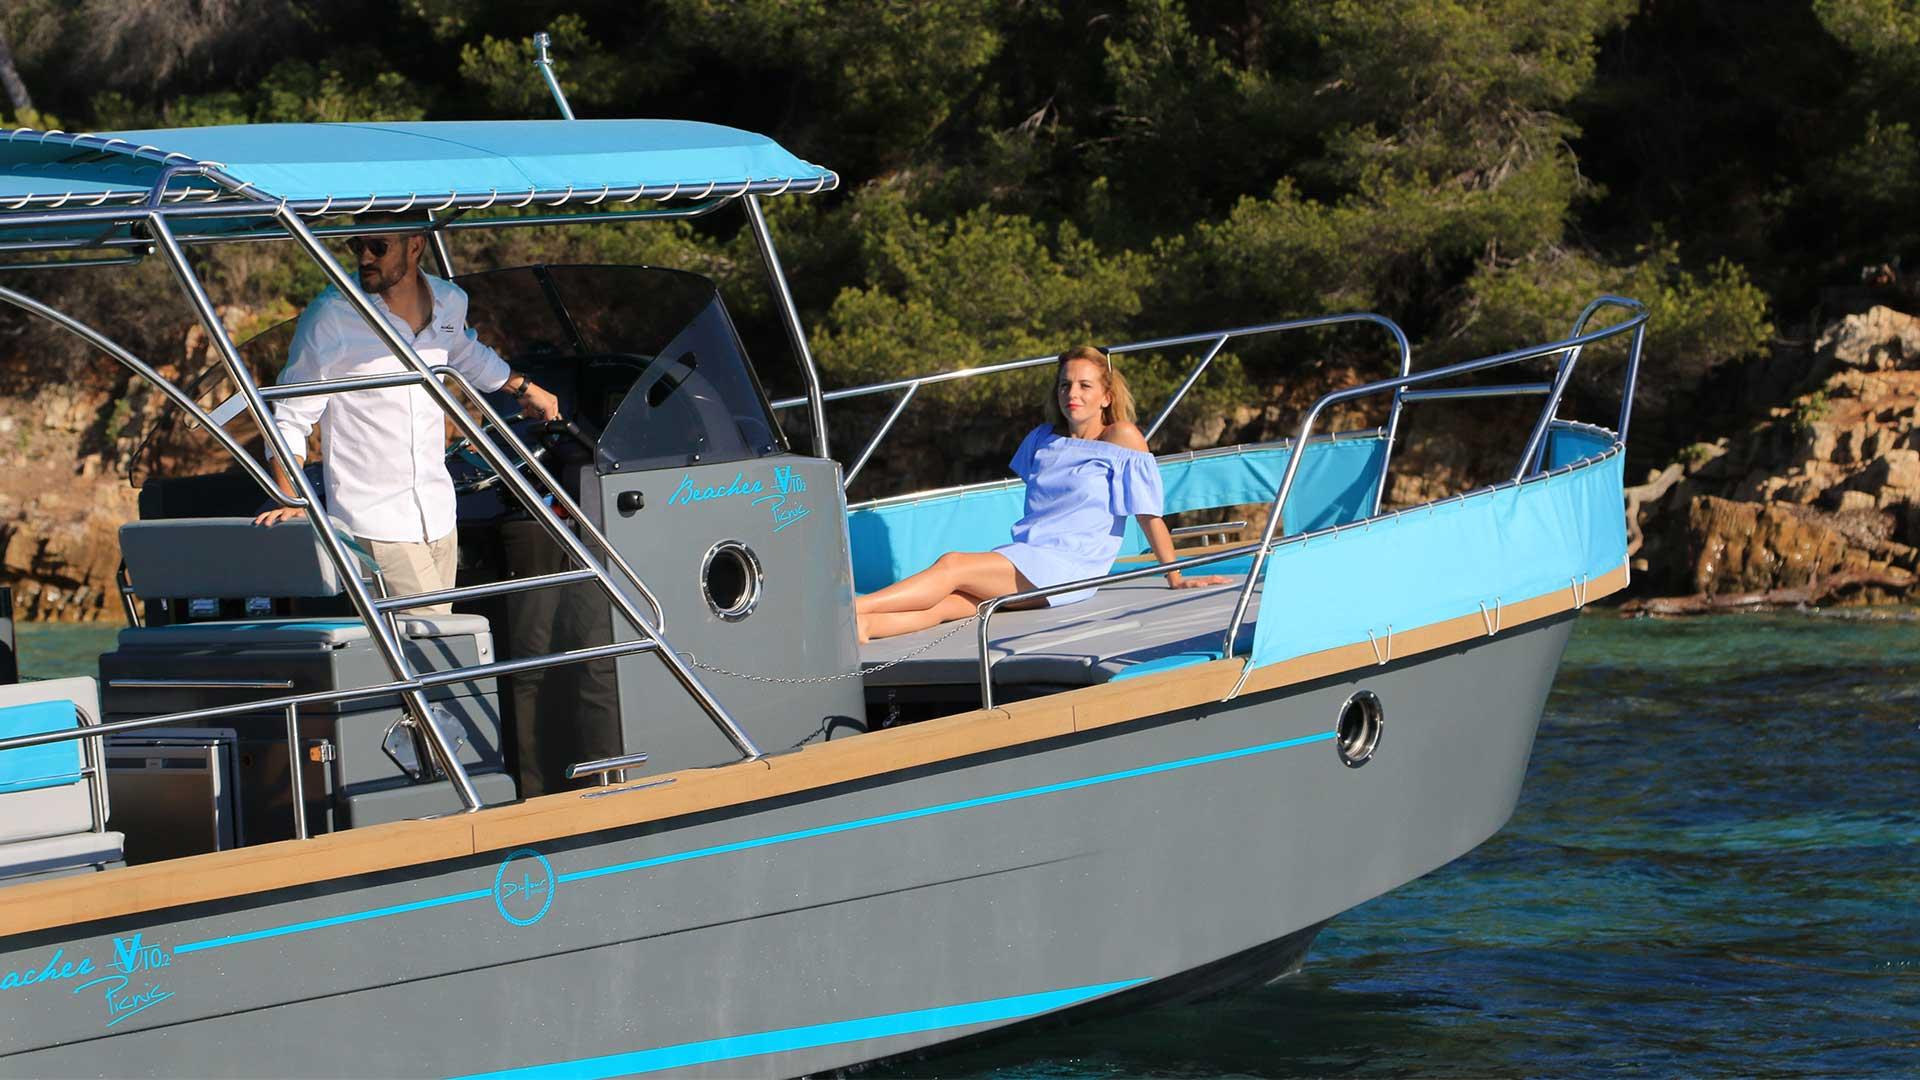 beacher-nautique-bateau-croisiere-pic-nic-bleu